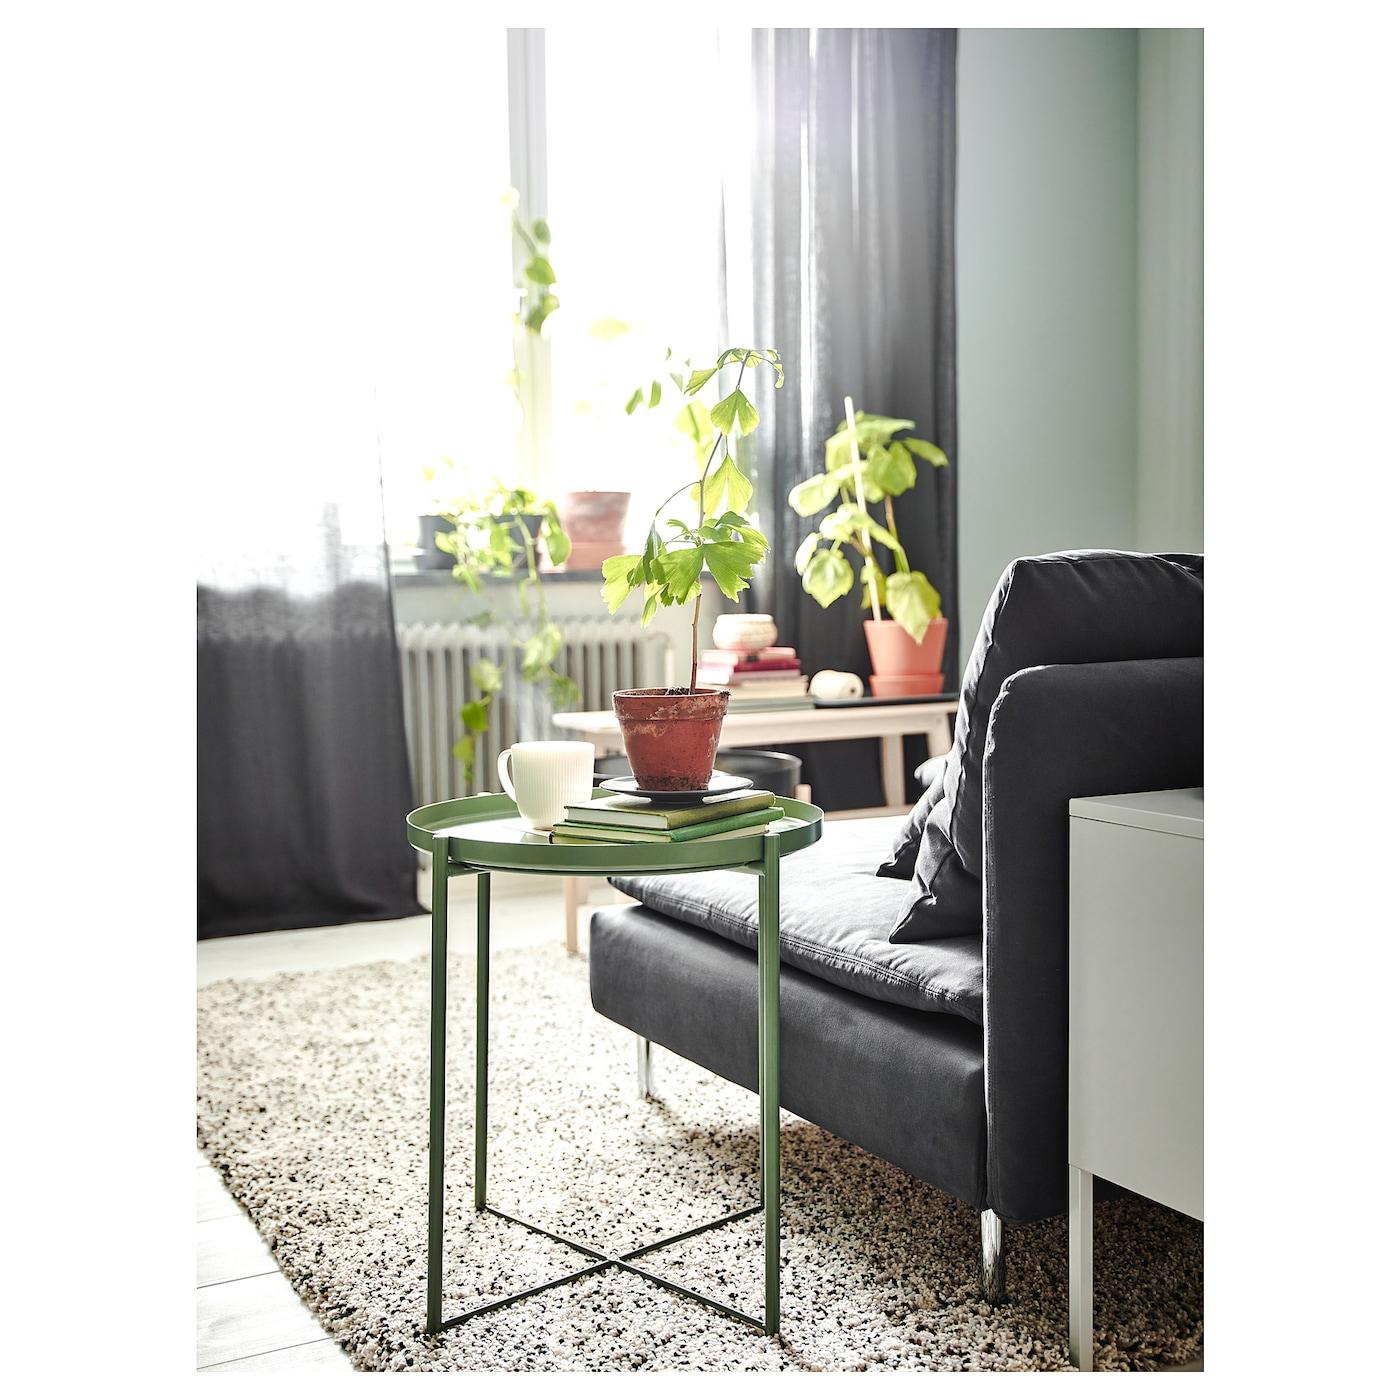 Gladom Table/plateau - Vert Foncé 45X53 Cm avec Table Basse De Jardin Ikea